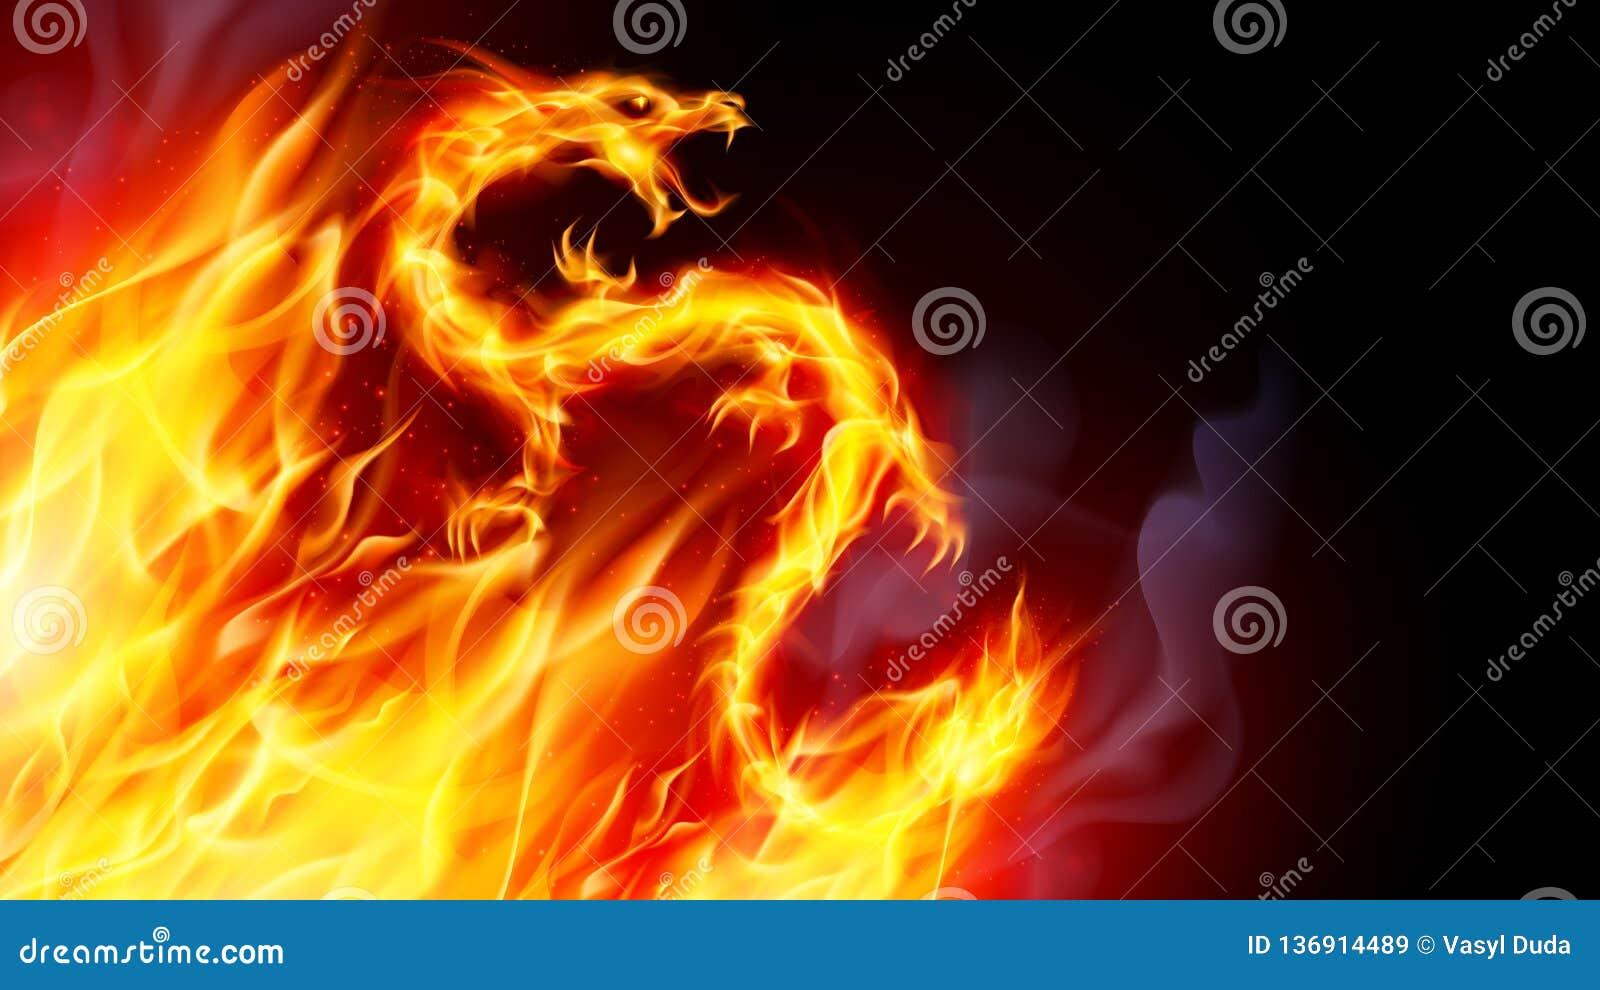 Fire Dragon stock illustration. Illustration of background ...Fire Flames Dragon